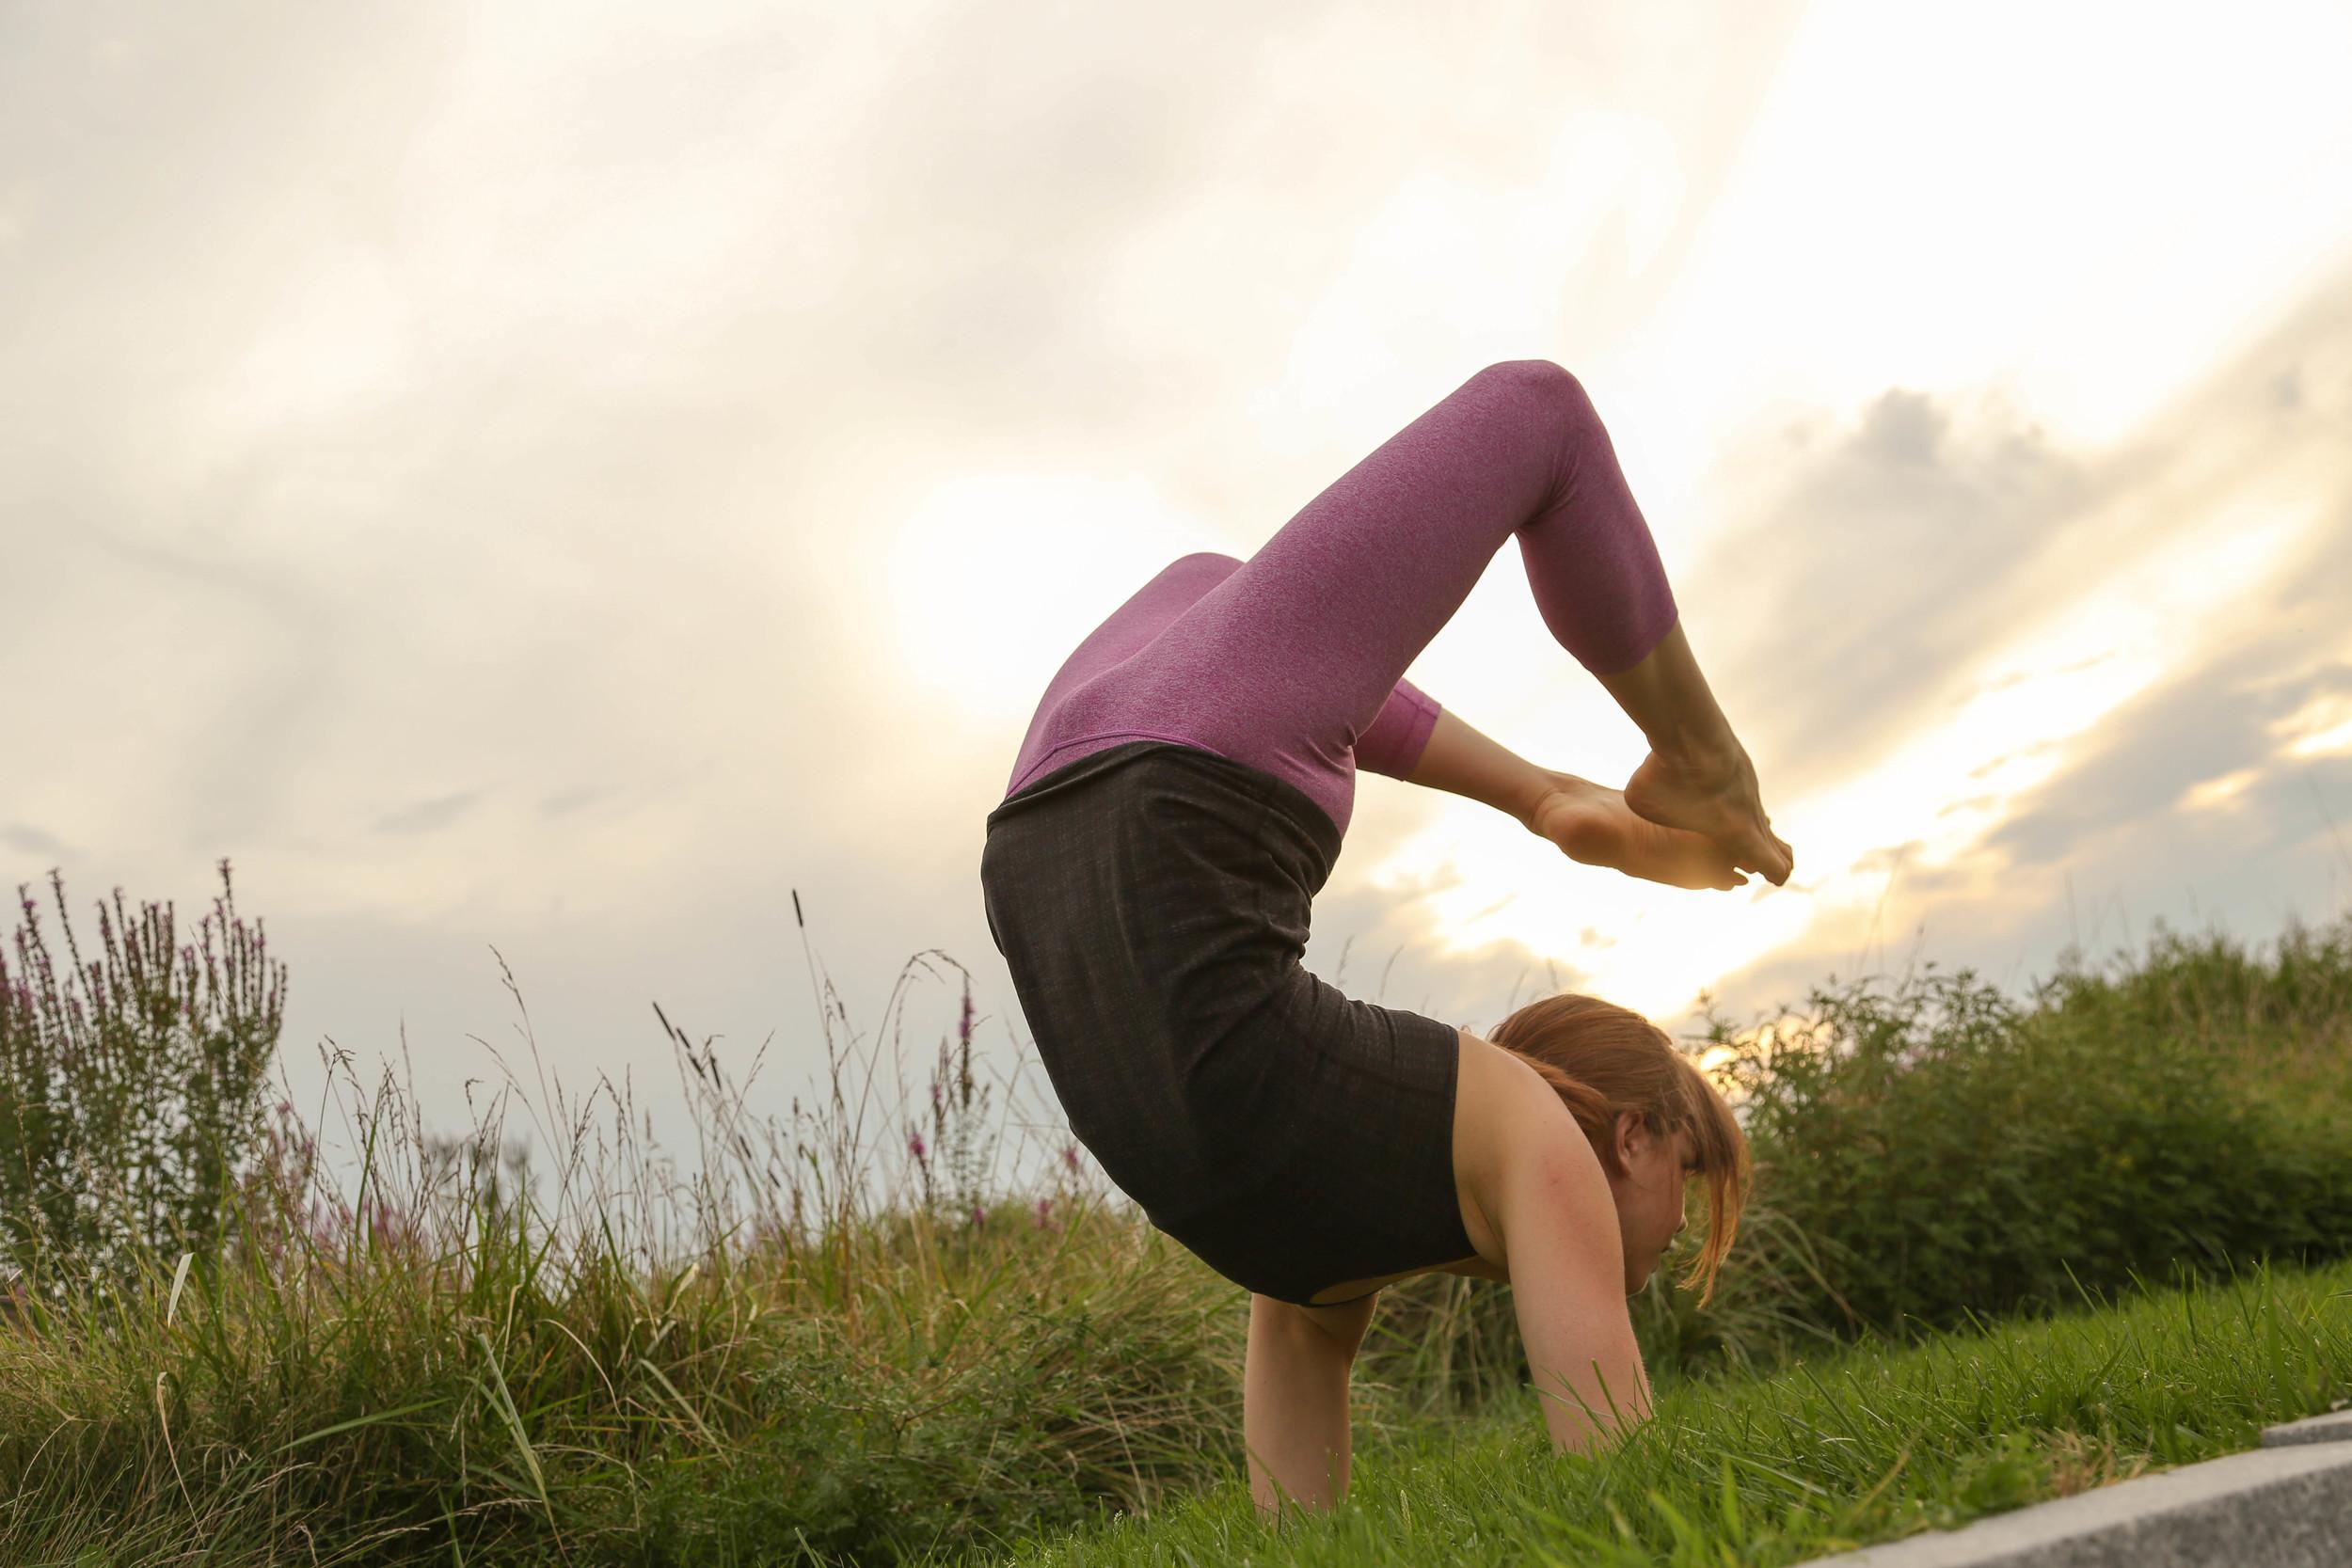 Tracy_Rodriguez_Photography_Yoga_Portfolio_Amy_Coleman_Yoga-8405.jpg